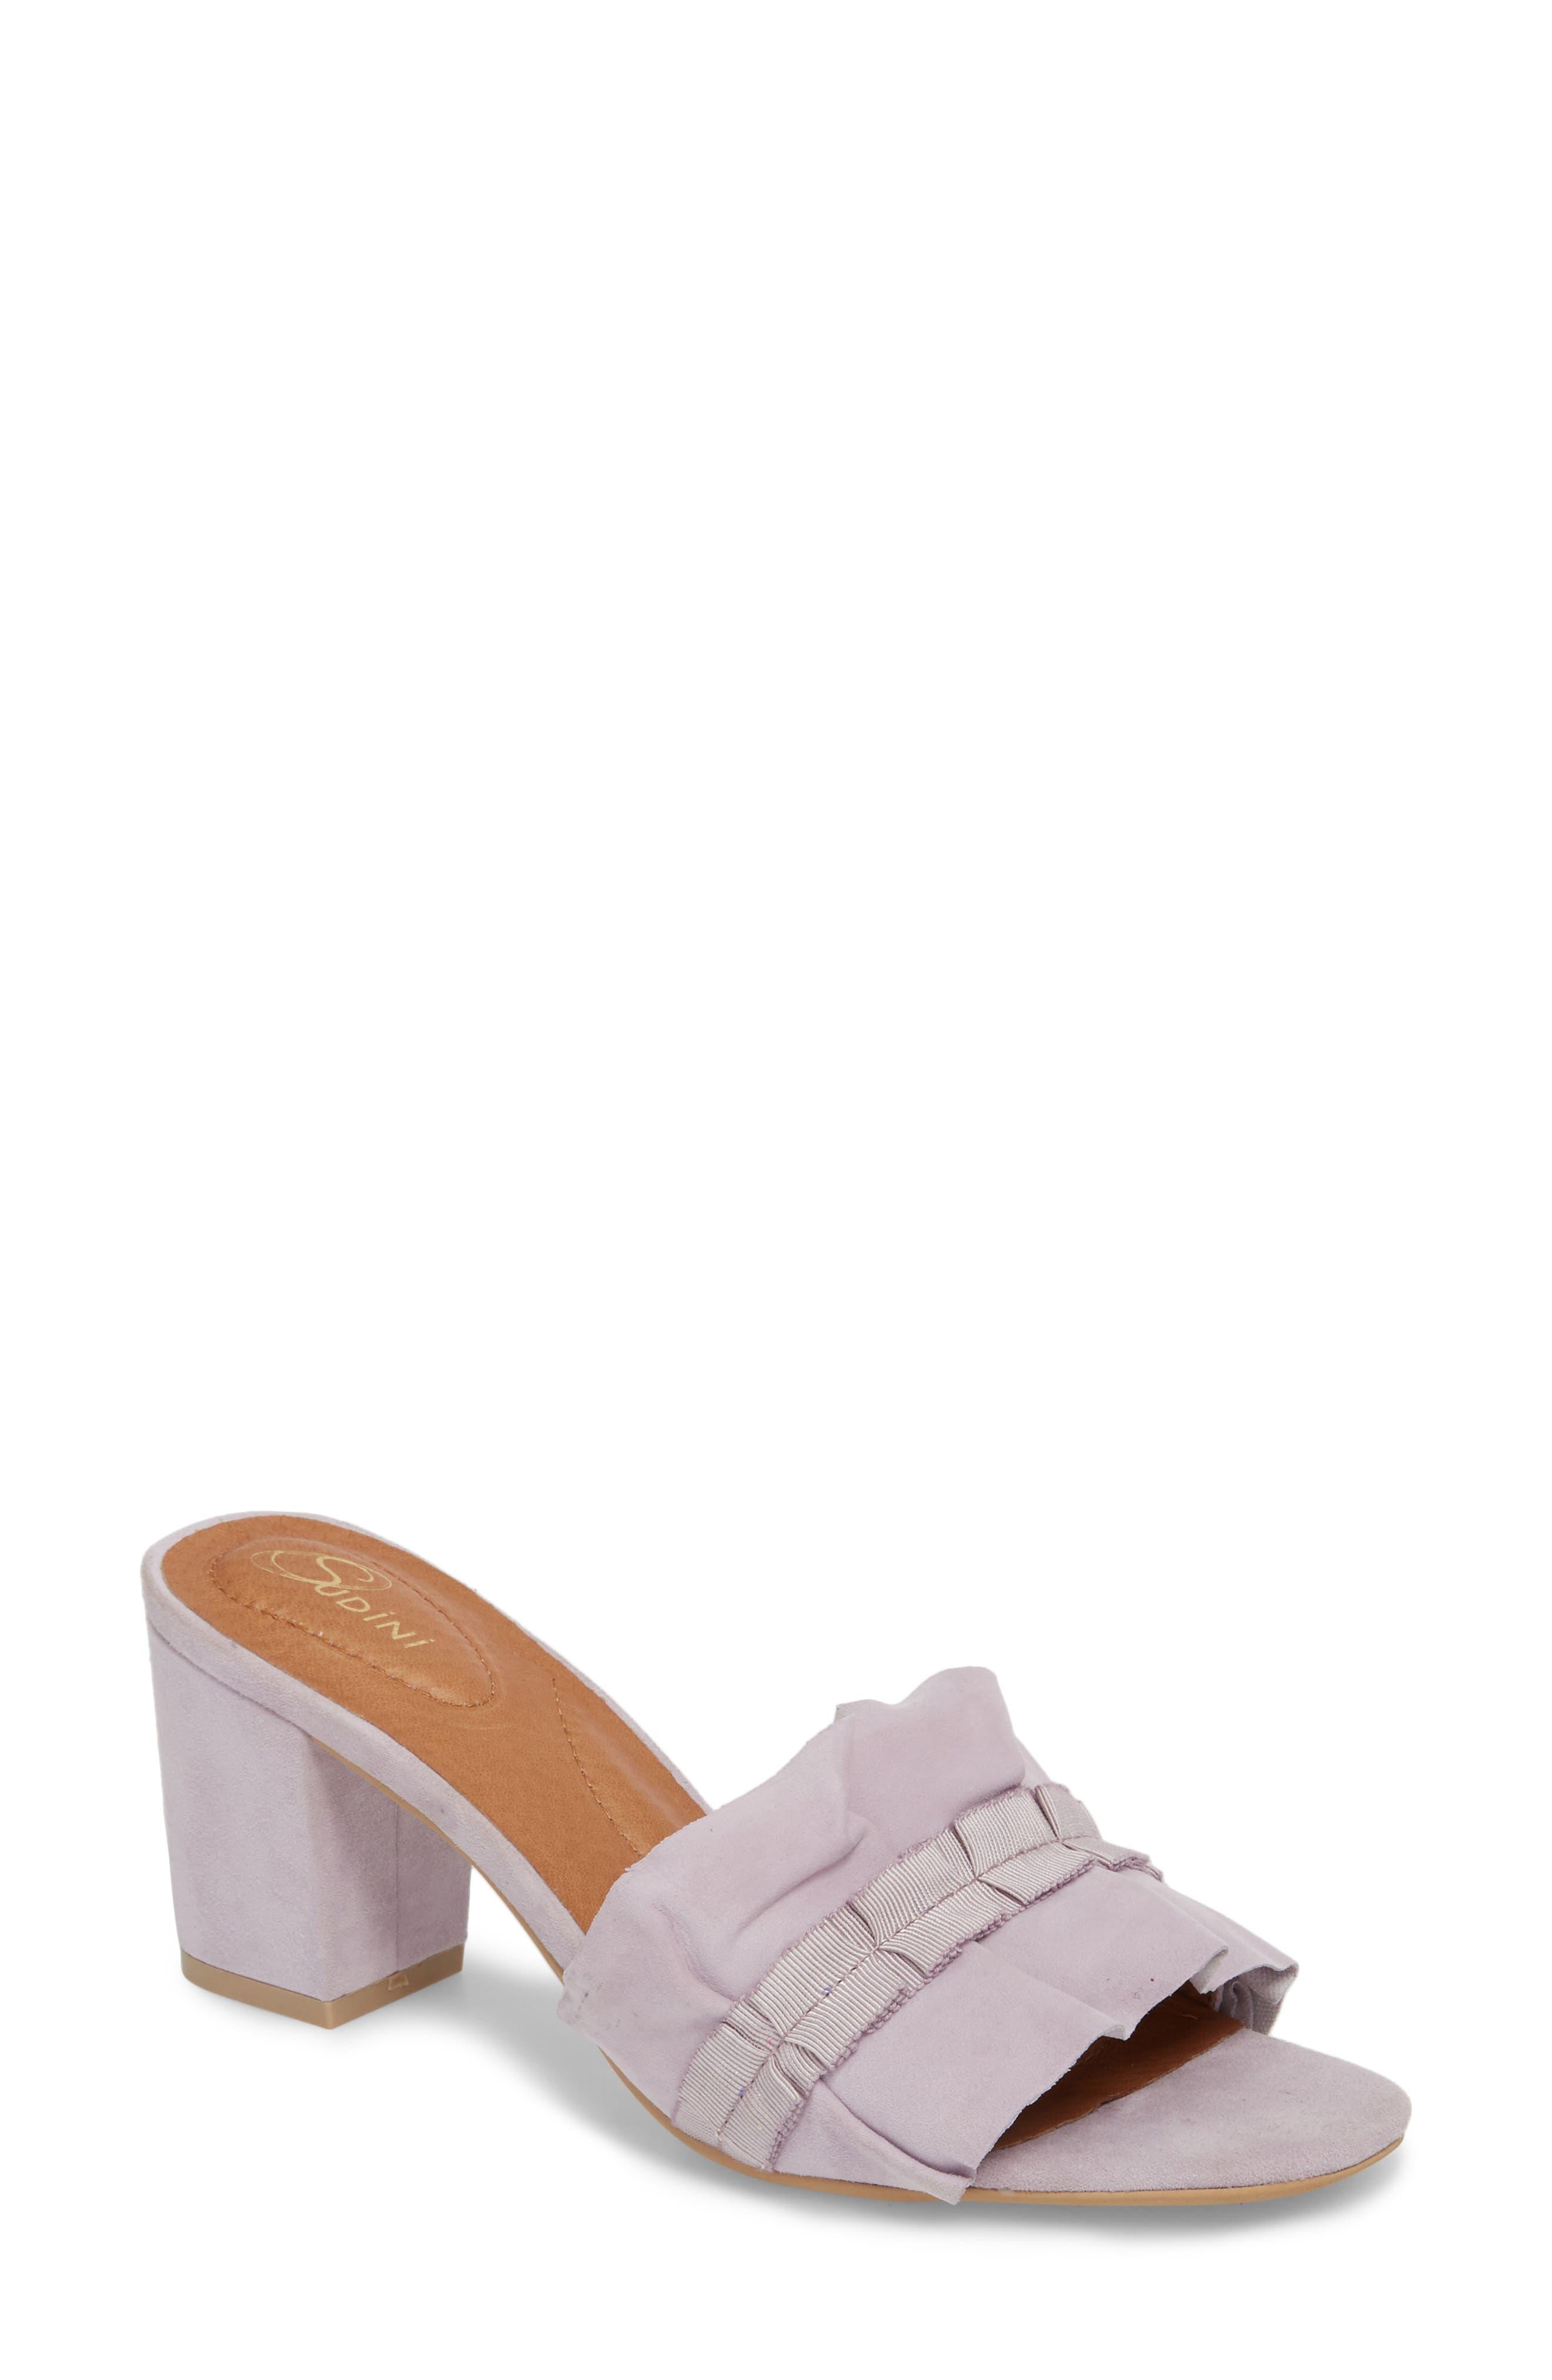 Nea Sandal,                         Main,                         color, Lilac Suede